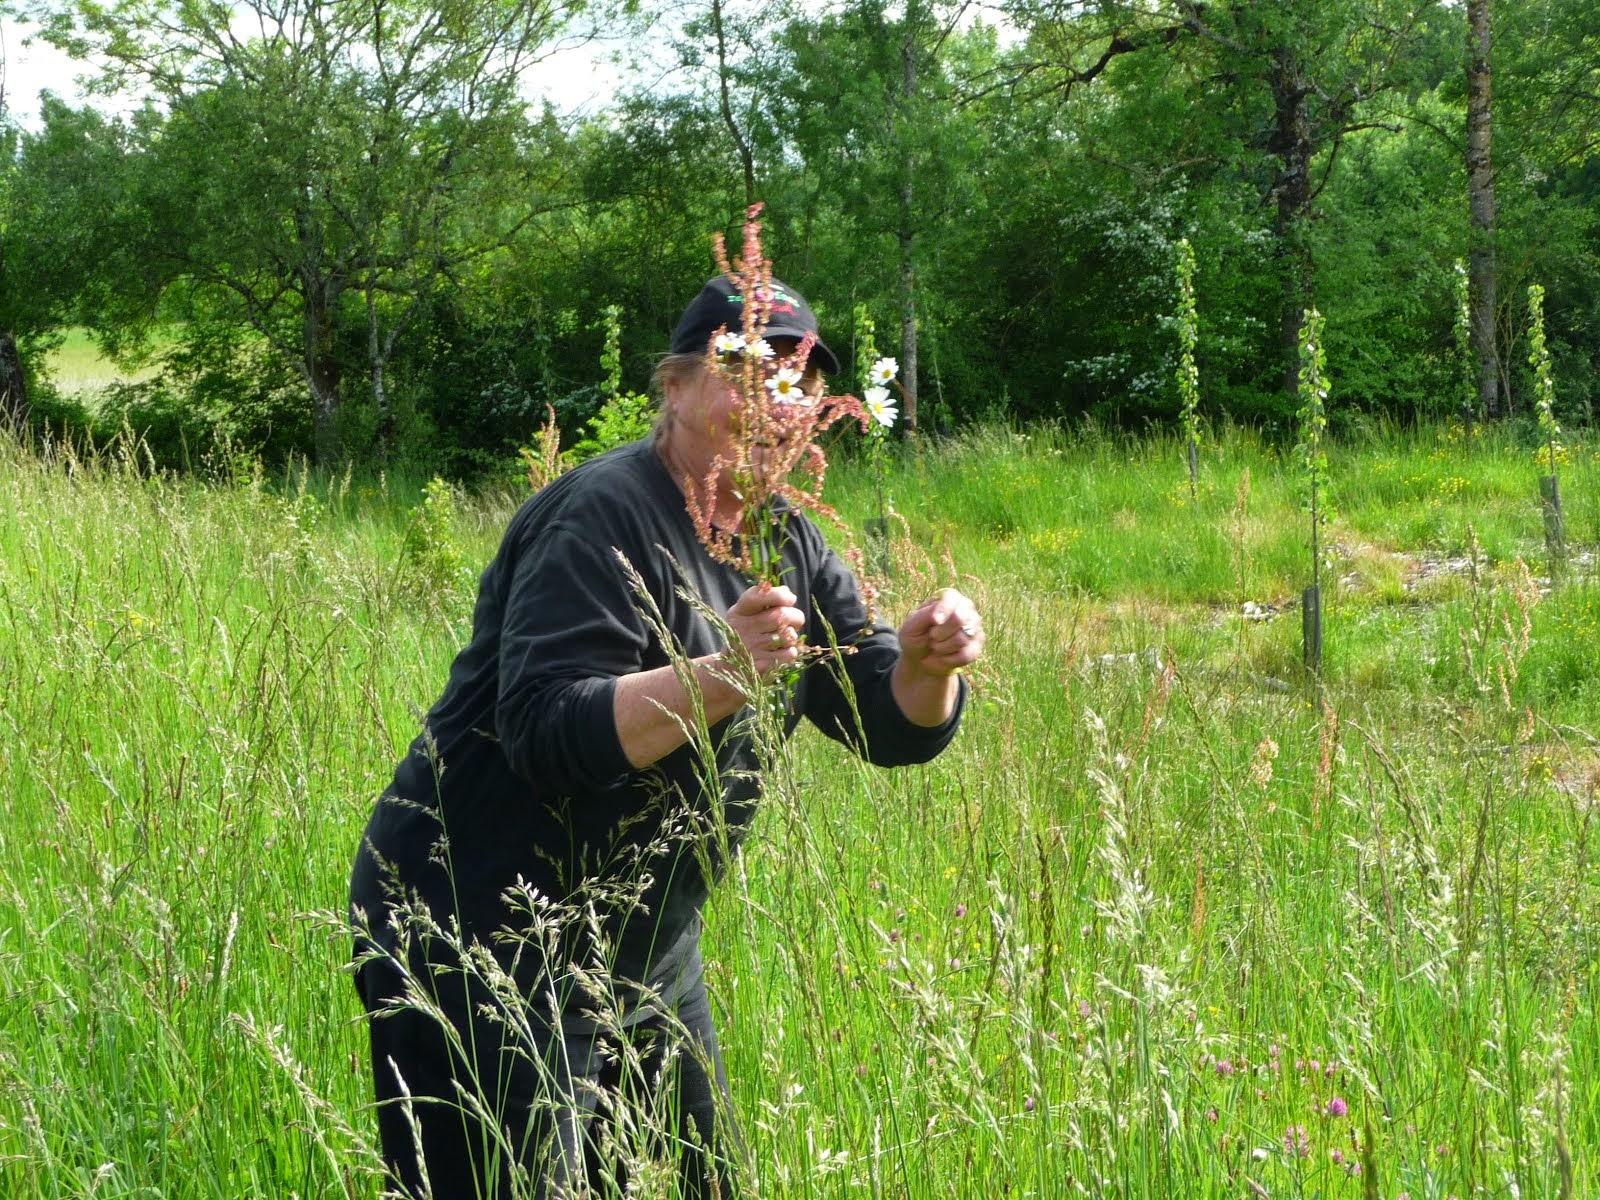 Val picking wildflowers